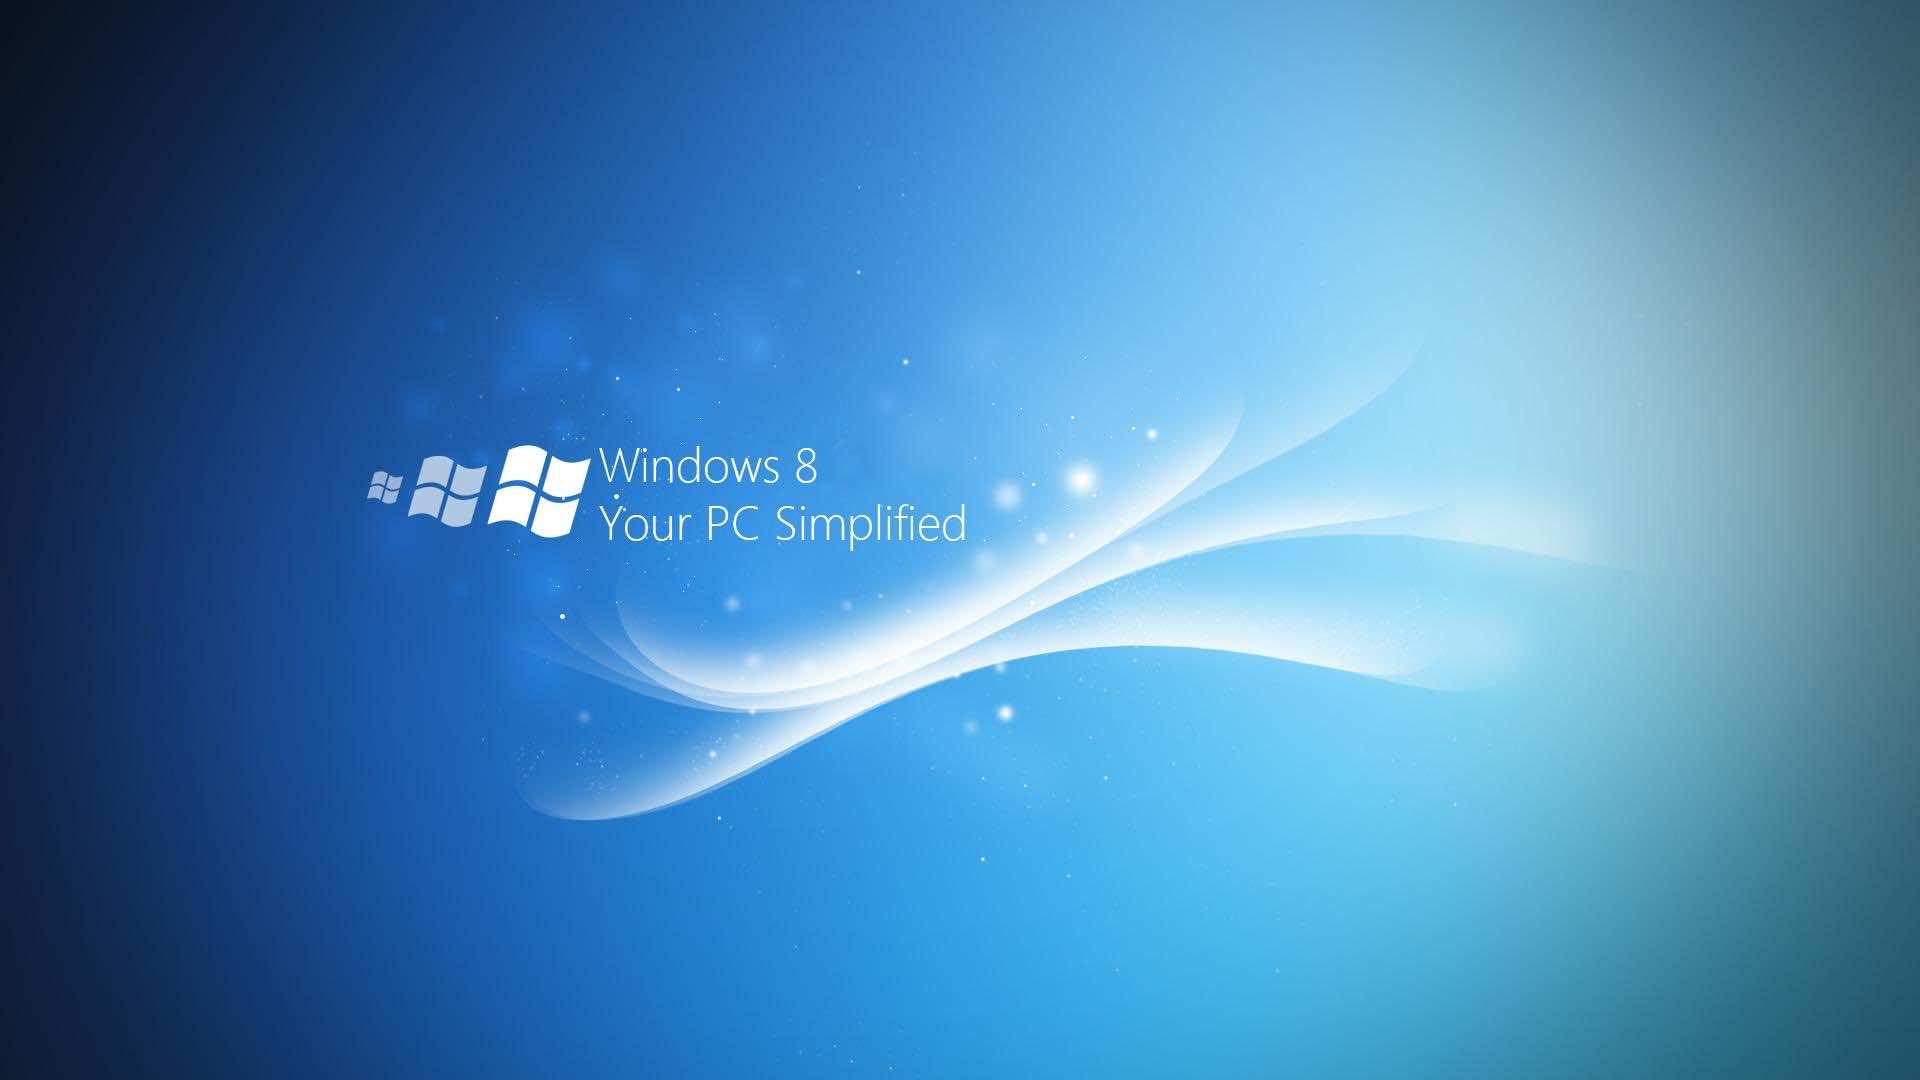 Windows 8 Wallpaper 27